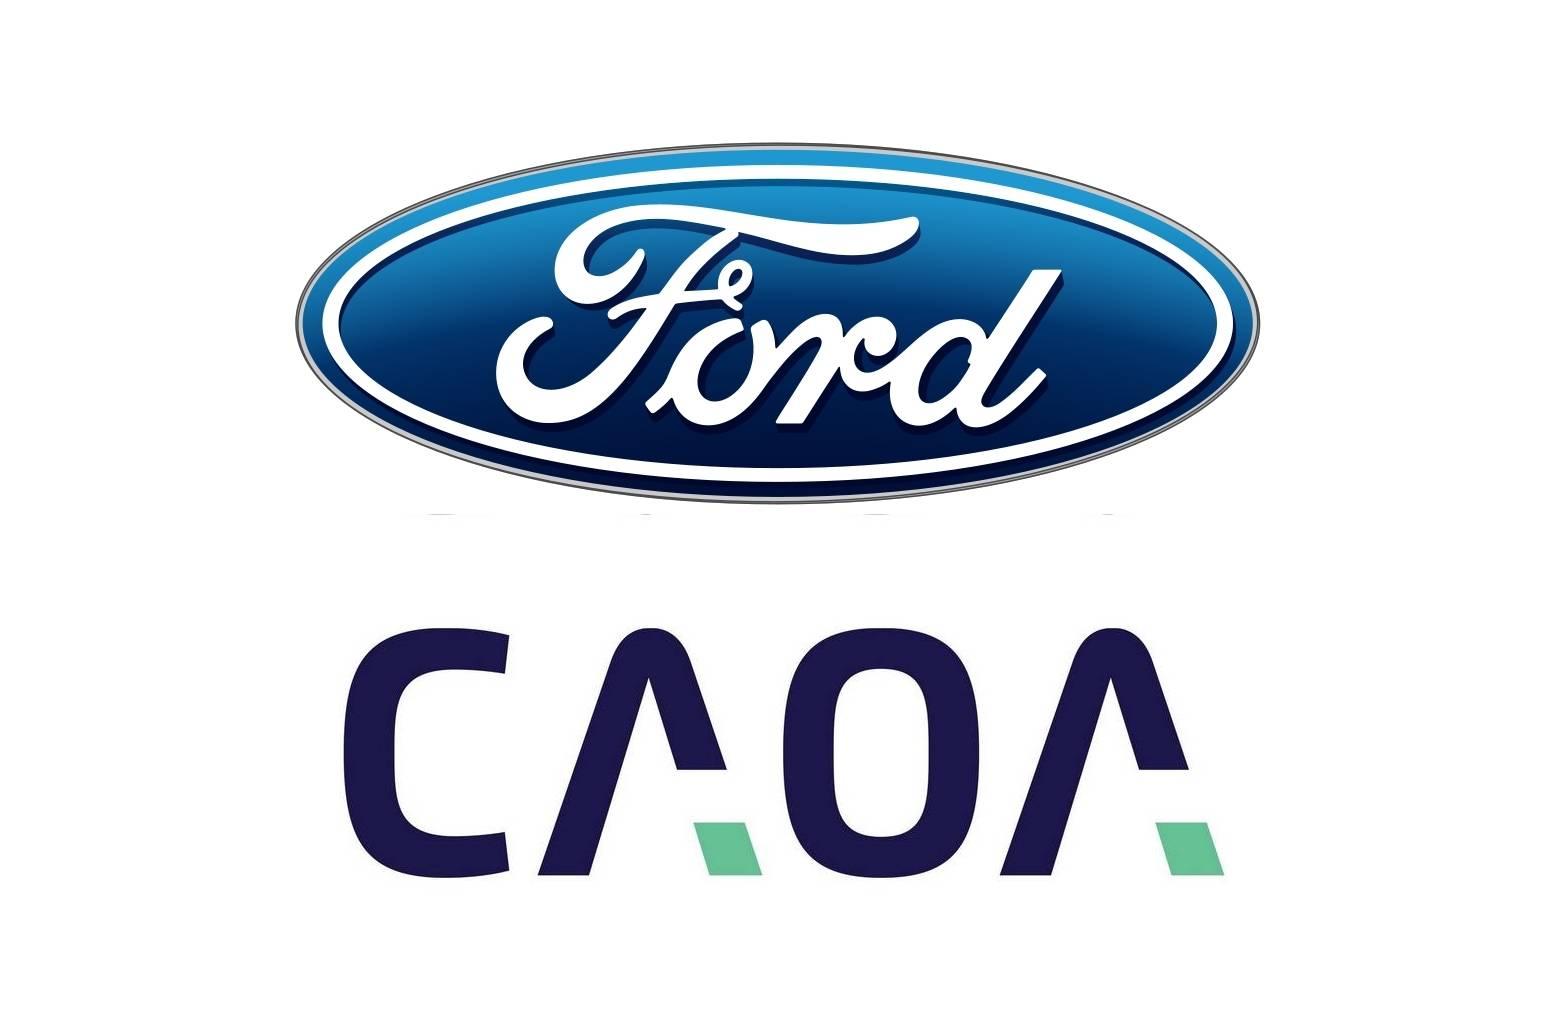 CAOA FORD